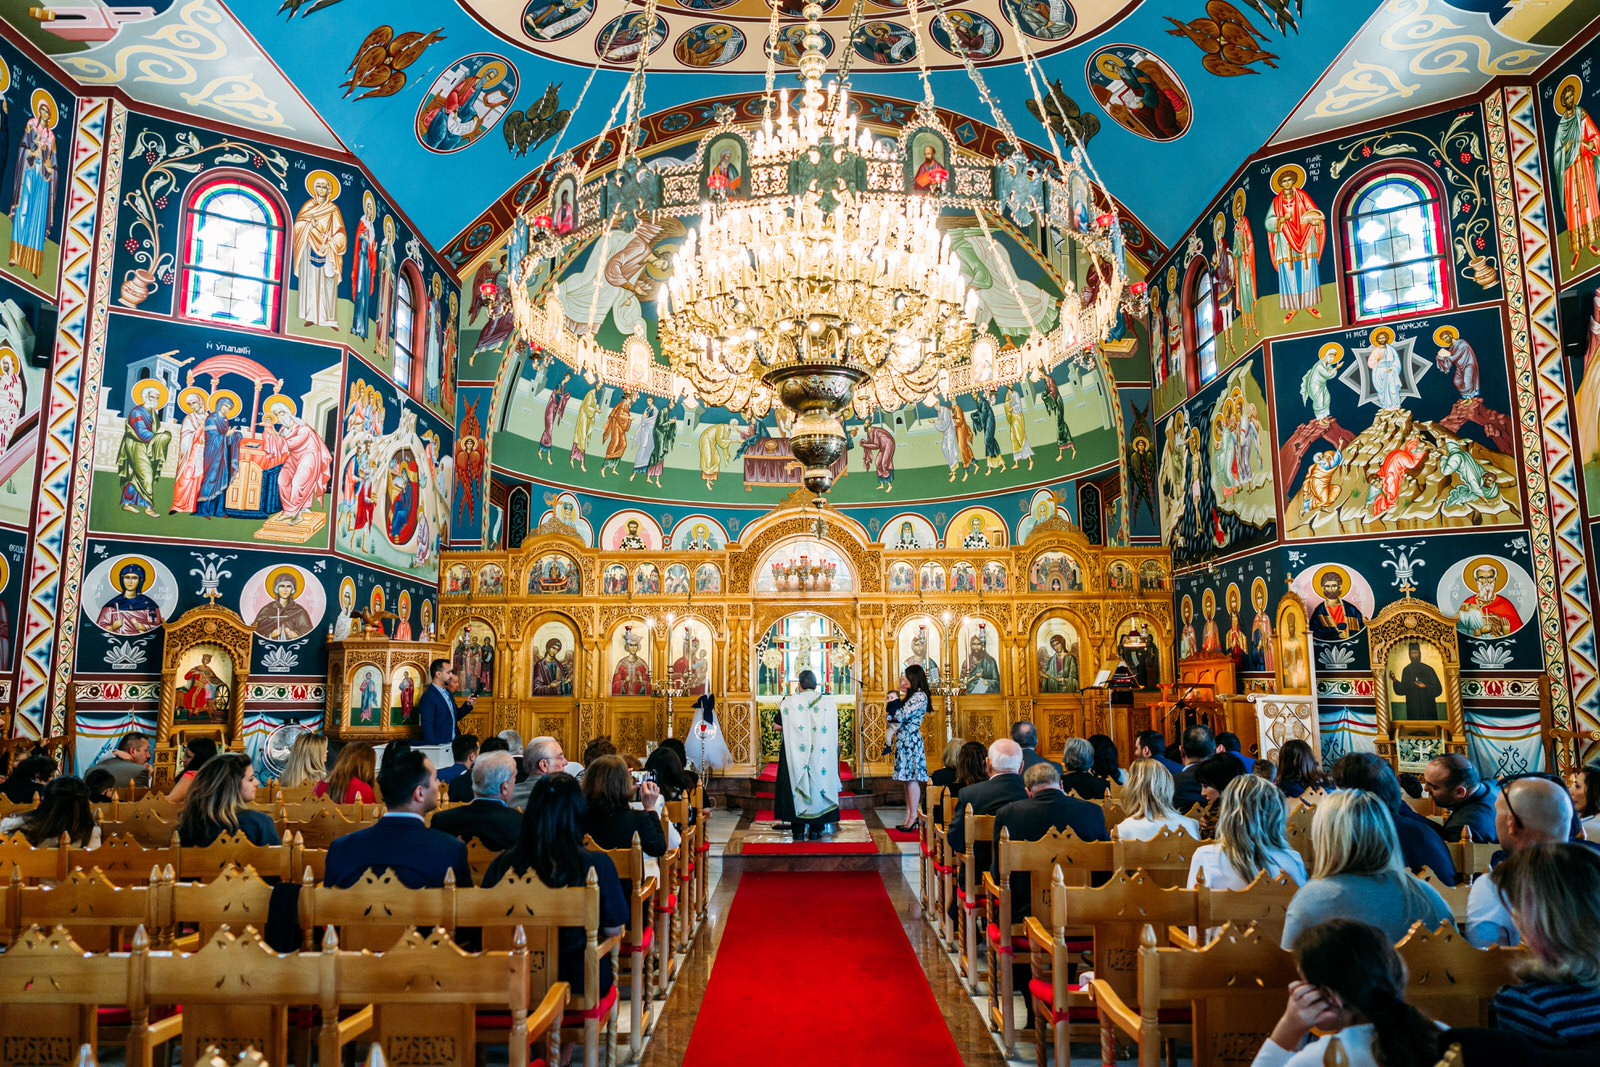 yianni-baptism-st-catherine-orthodox-mascot-laqua-79